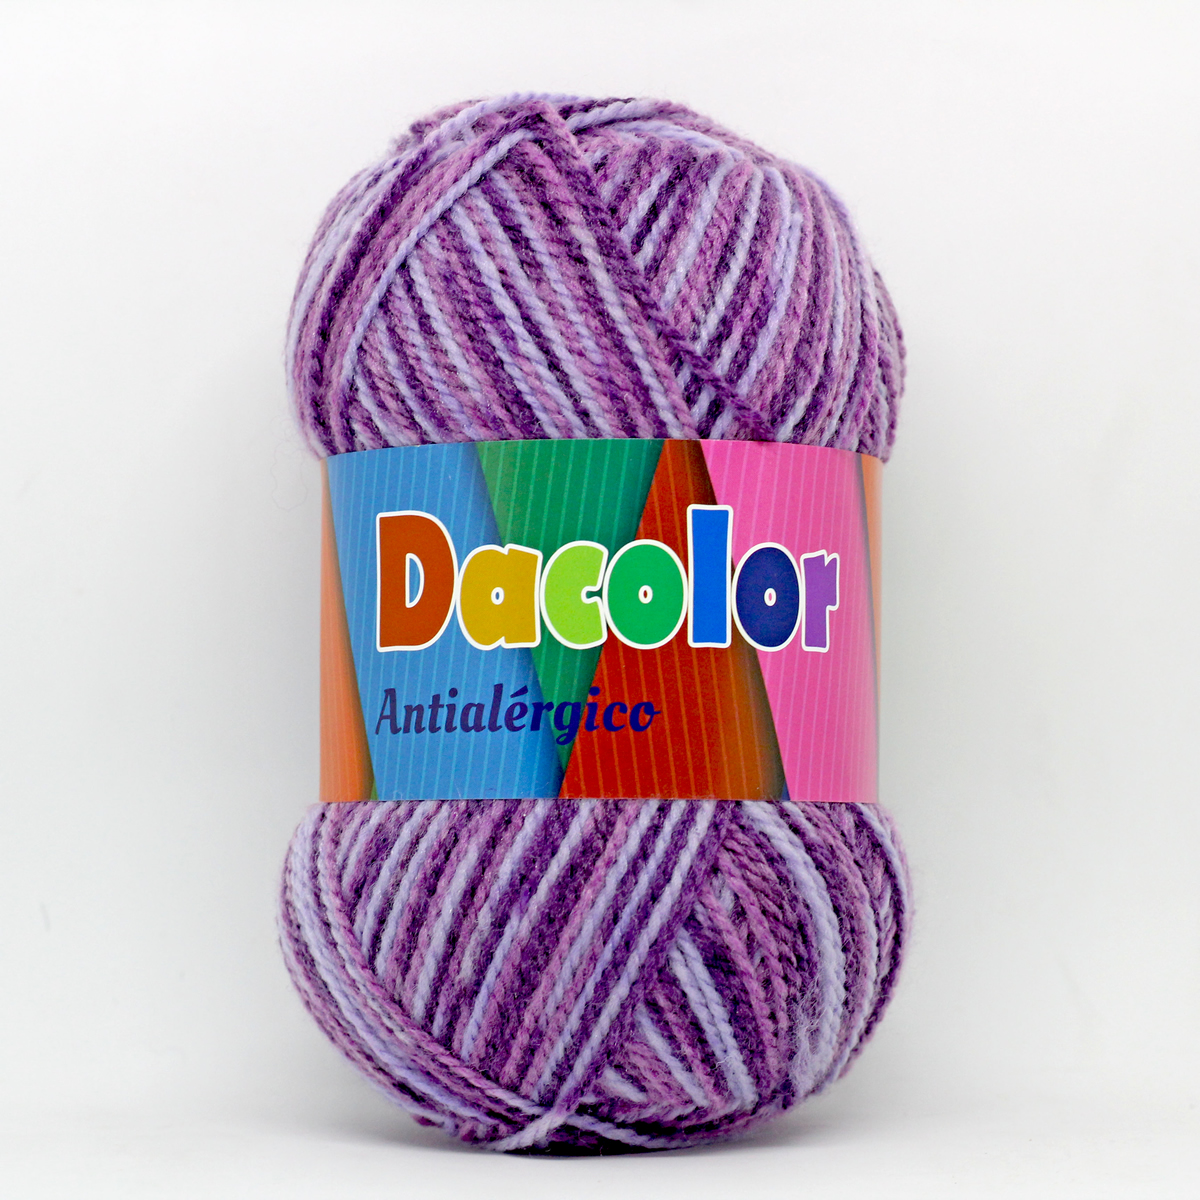 Dacolor - 56